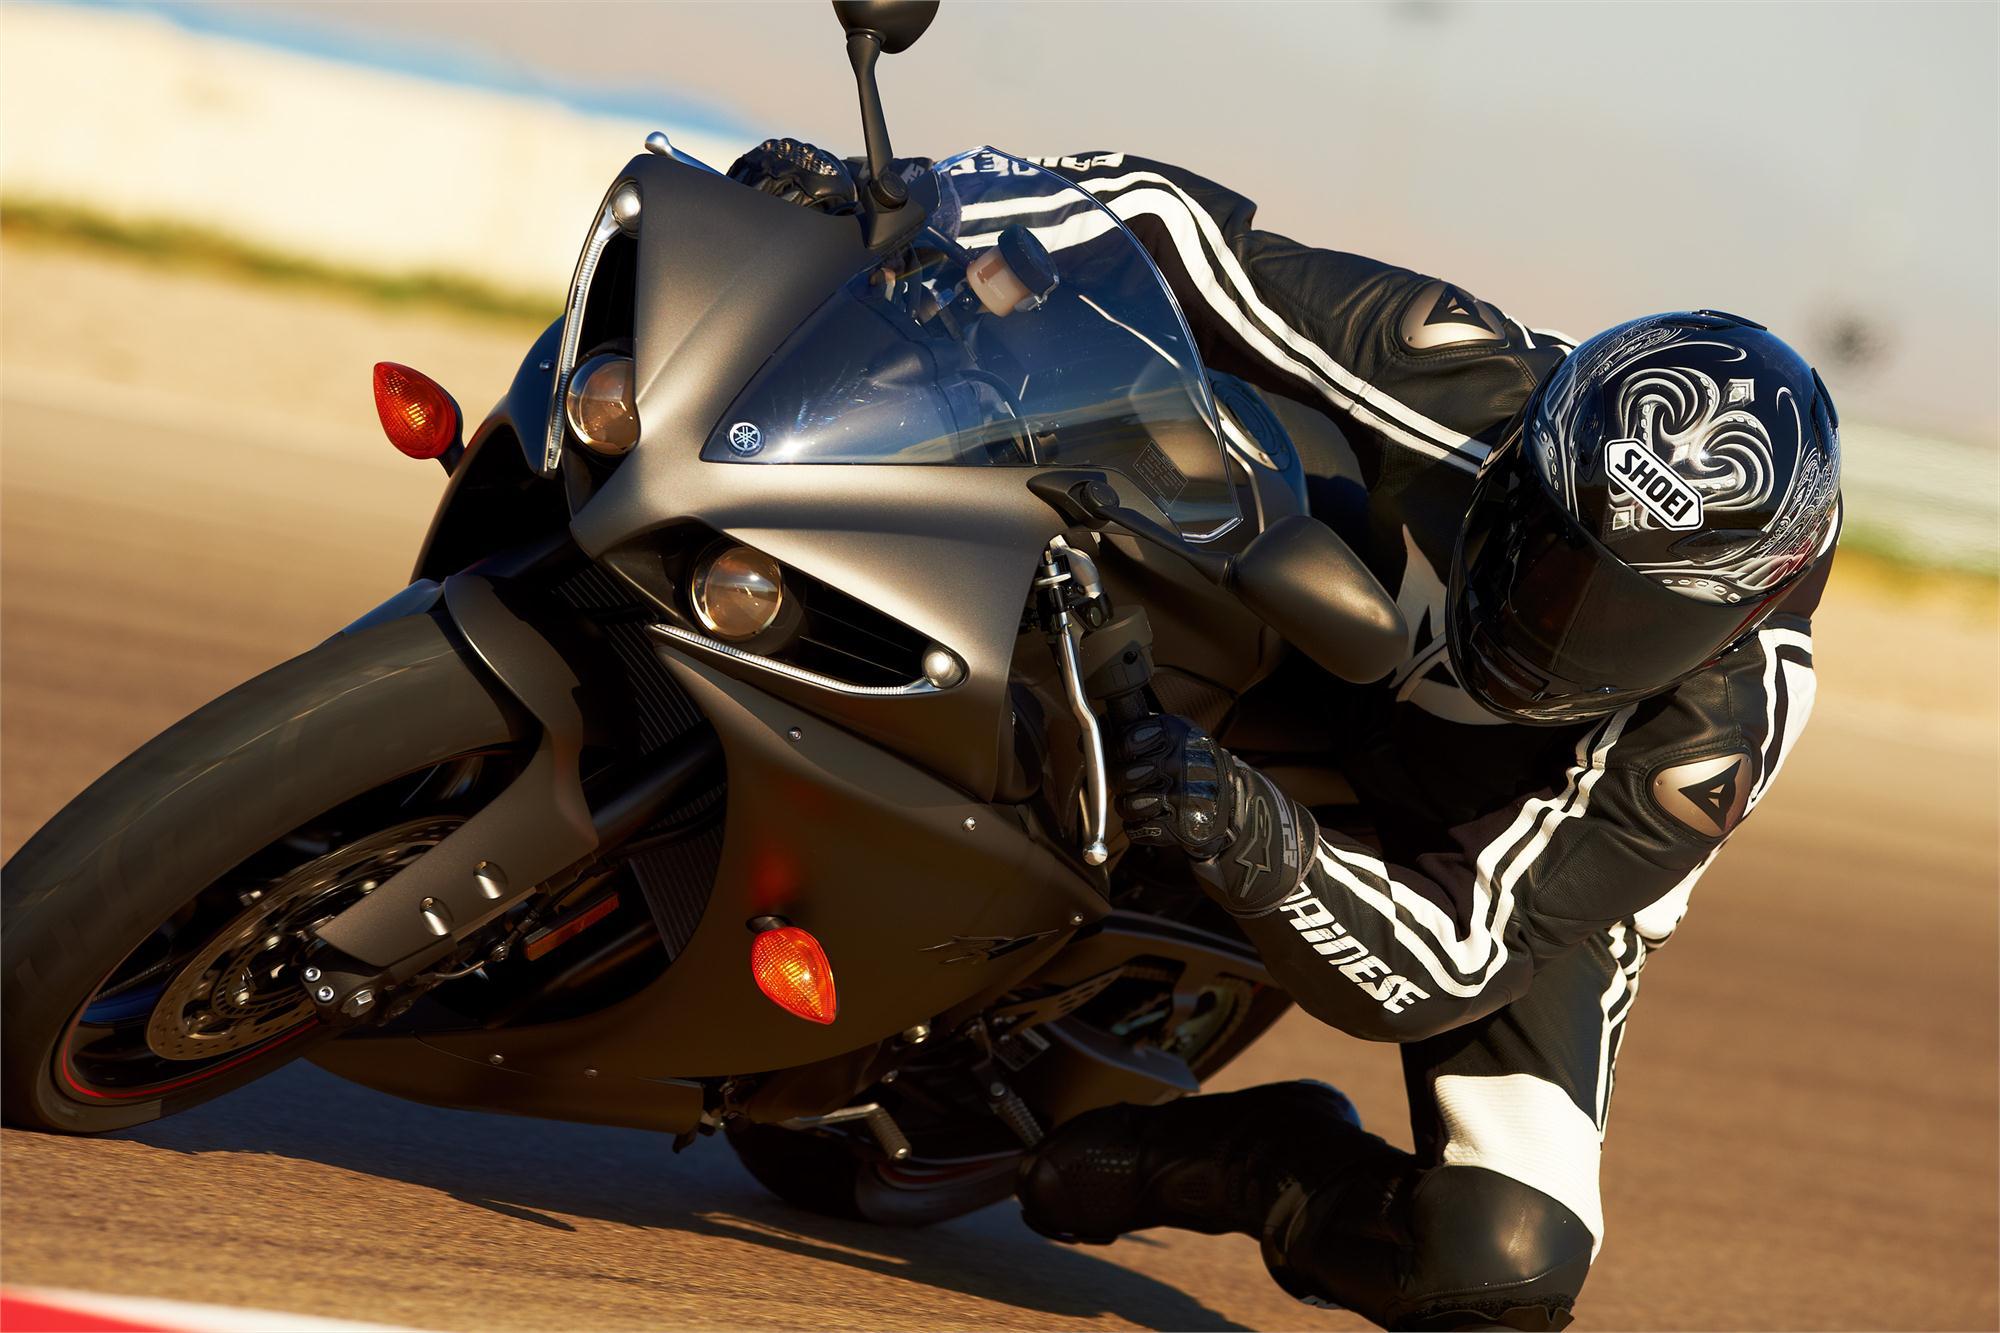 Yamaha Yzf R1 Specs 2012 2013 2014 2015 2016 2017 2018 2019